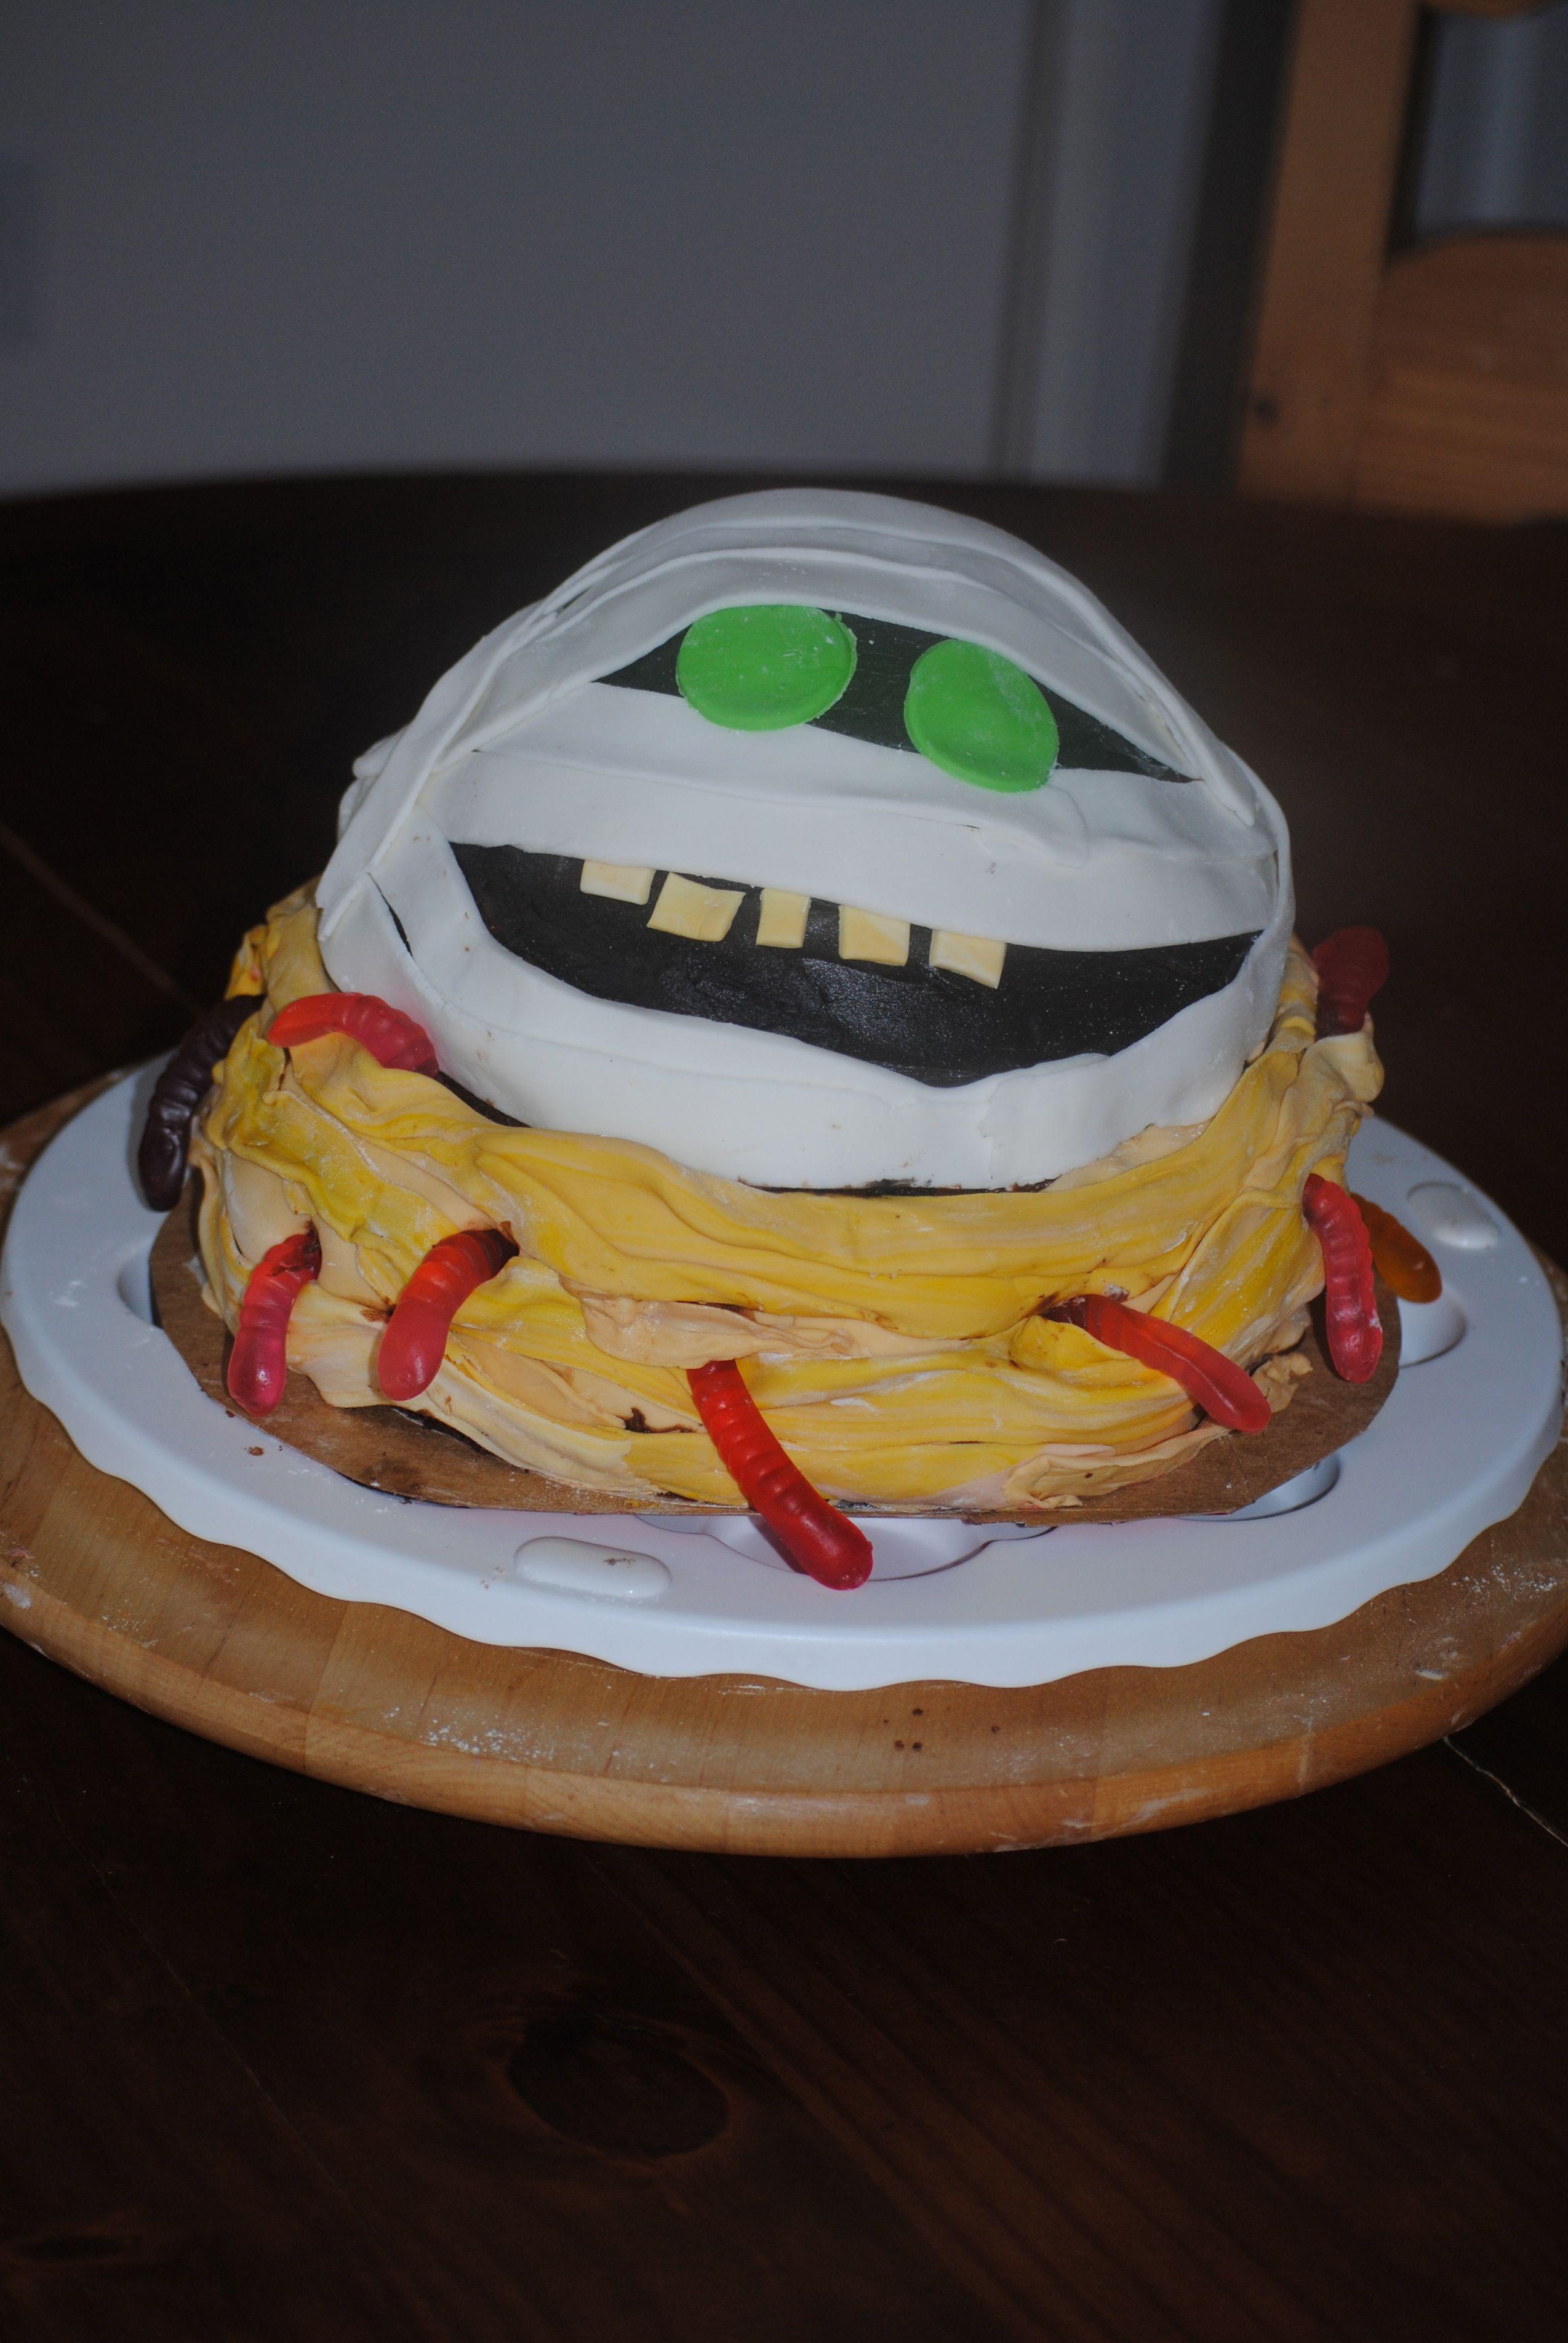 Hotel Transylvania Cake Love